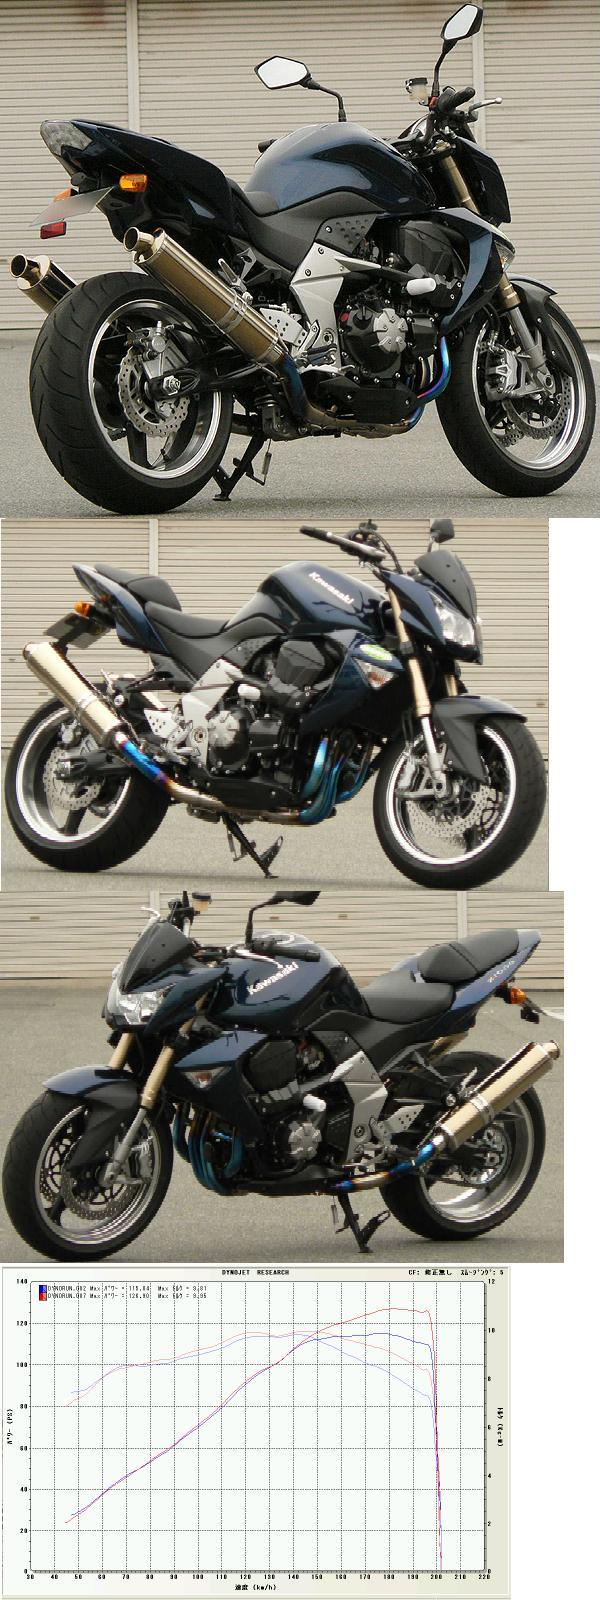 【BEET】New NASSERT-R T2 全段排氣管 - 「Webike-摩托百貨」